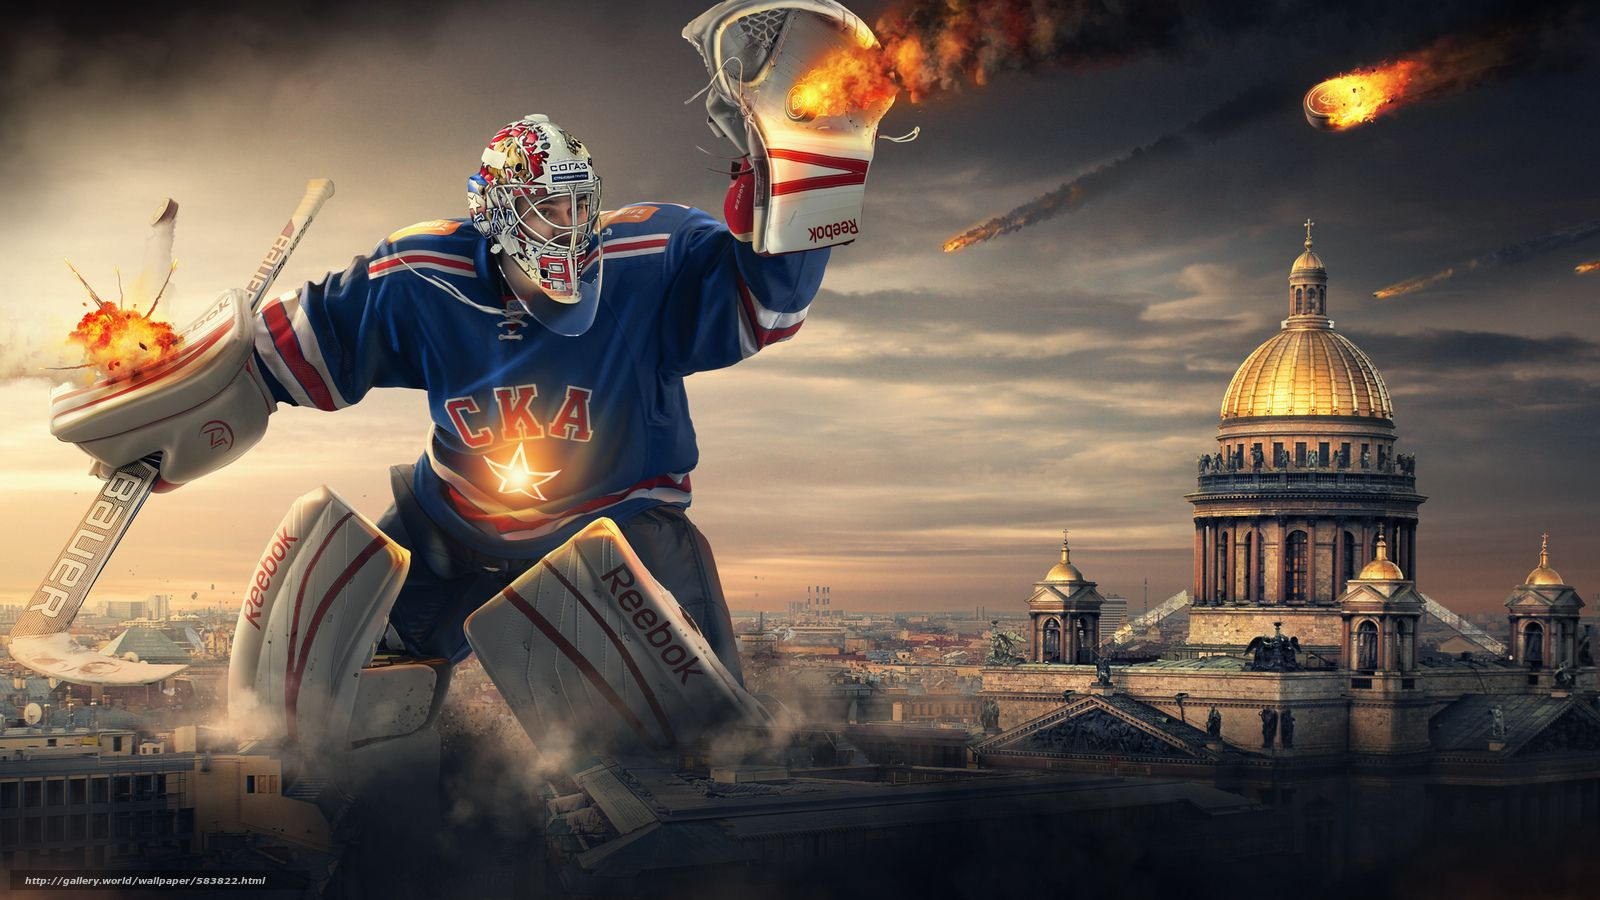 Carey price wallpapers montreal habs montreal hockey 9 html code - Ice Hockey Goalie Wallpaper Google Suche